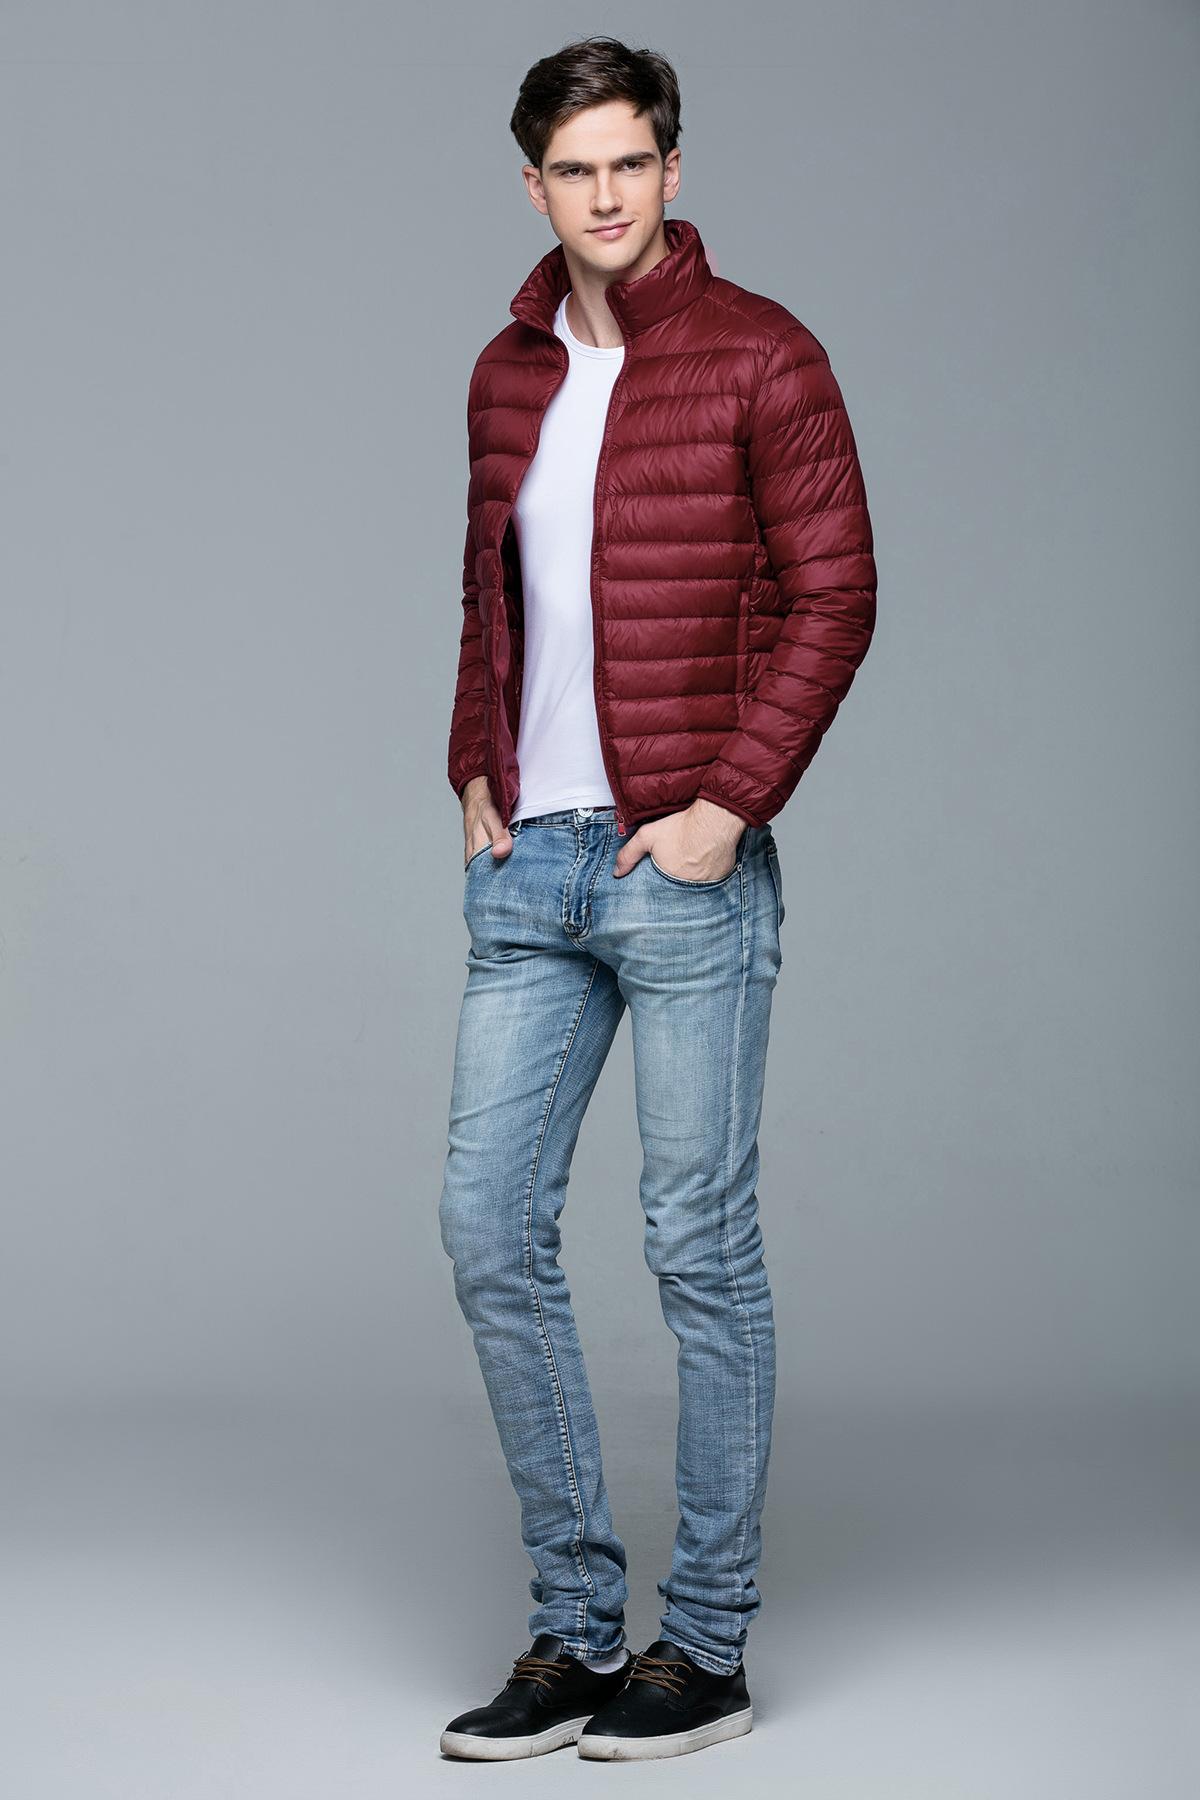 e9ec7aab6f0 Men s Winter Warm Down Coat Standard Collar Male Young Canada Jacket Down  Coat Long Sleeve Pocket Warm Wear Plus Size B-9592